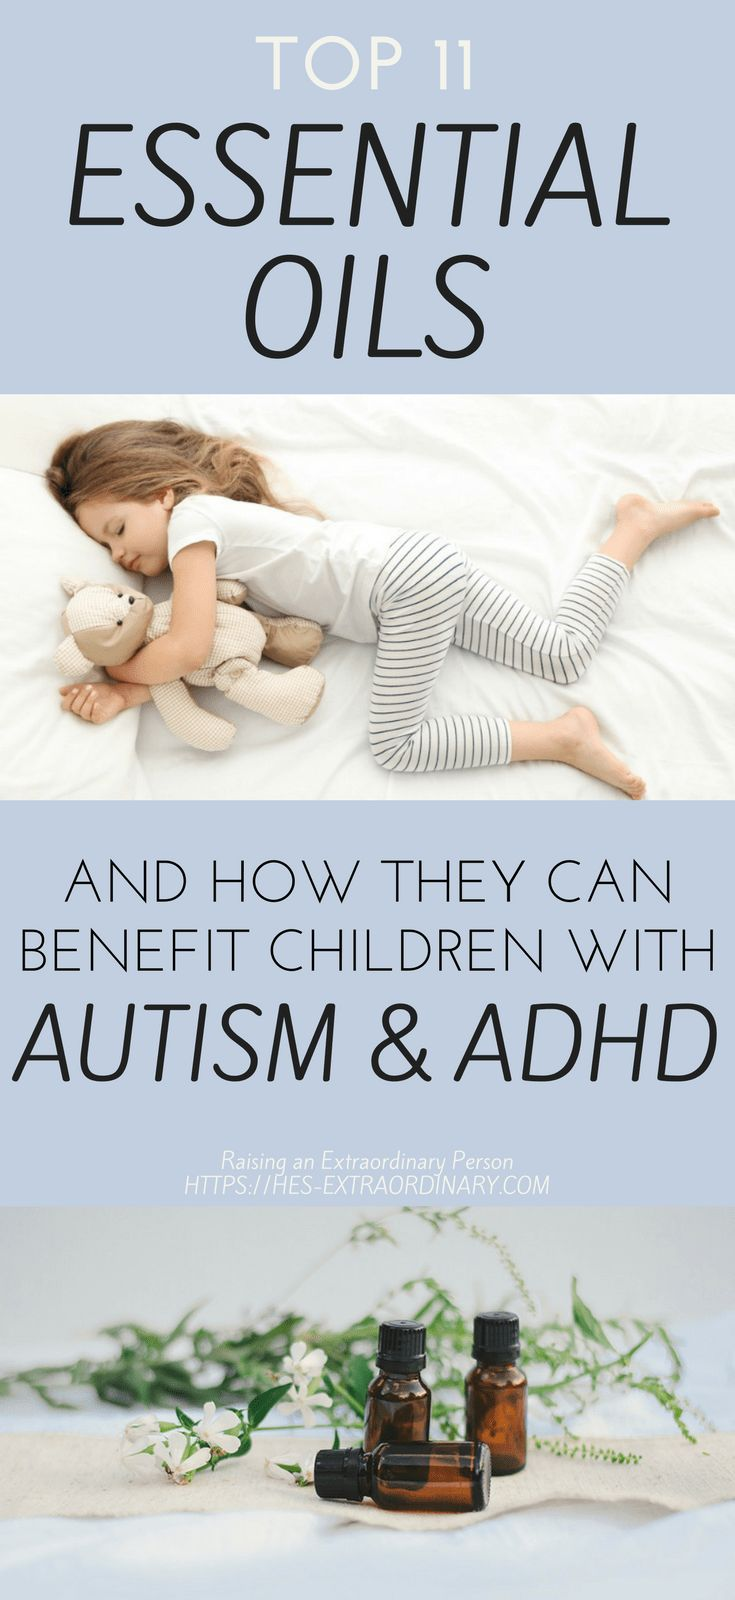 Top Essential Oils for Autism & ADHD - Essential Oils for Focus - Essential Oils for Calm - Essential Oils for better Sleep - Essential Oils for Kids